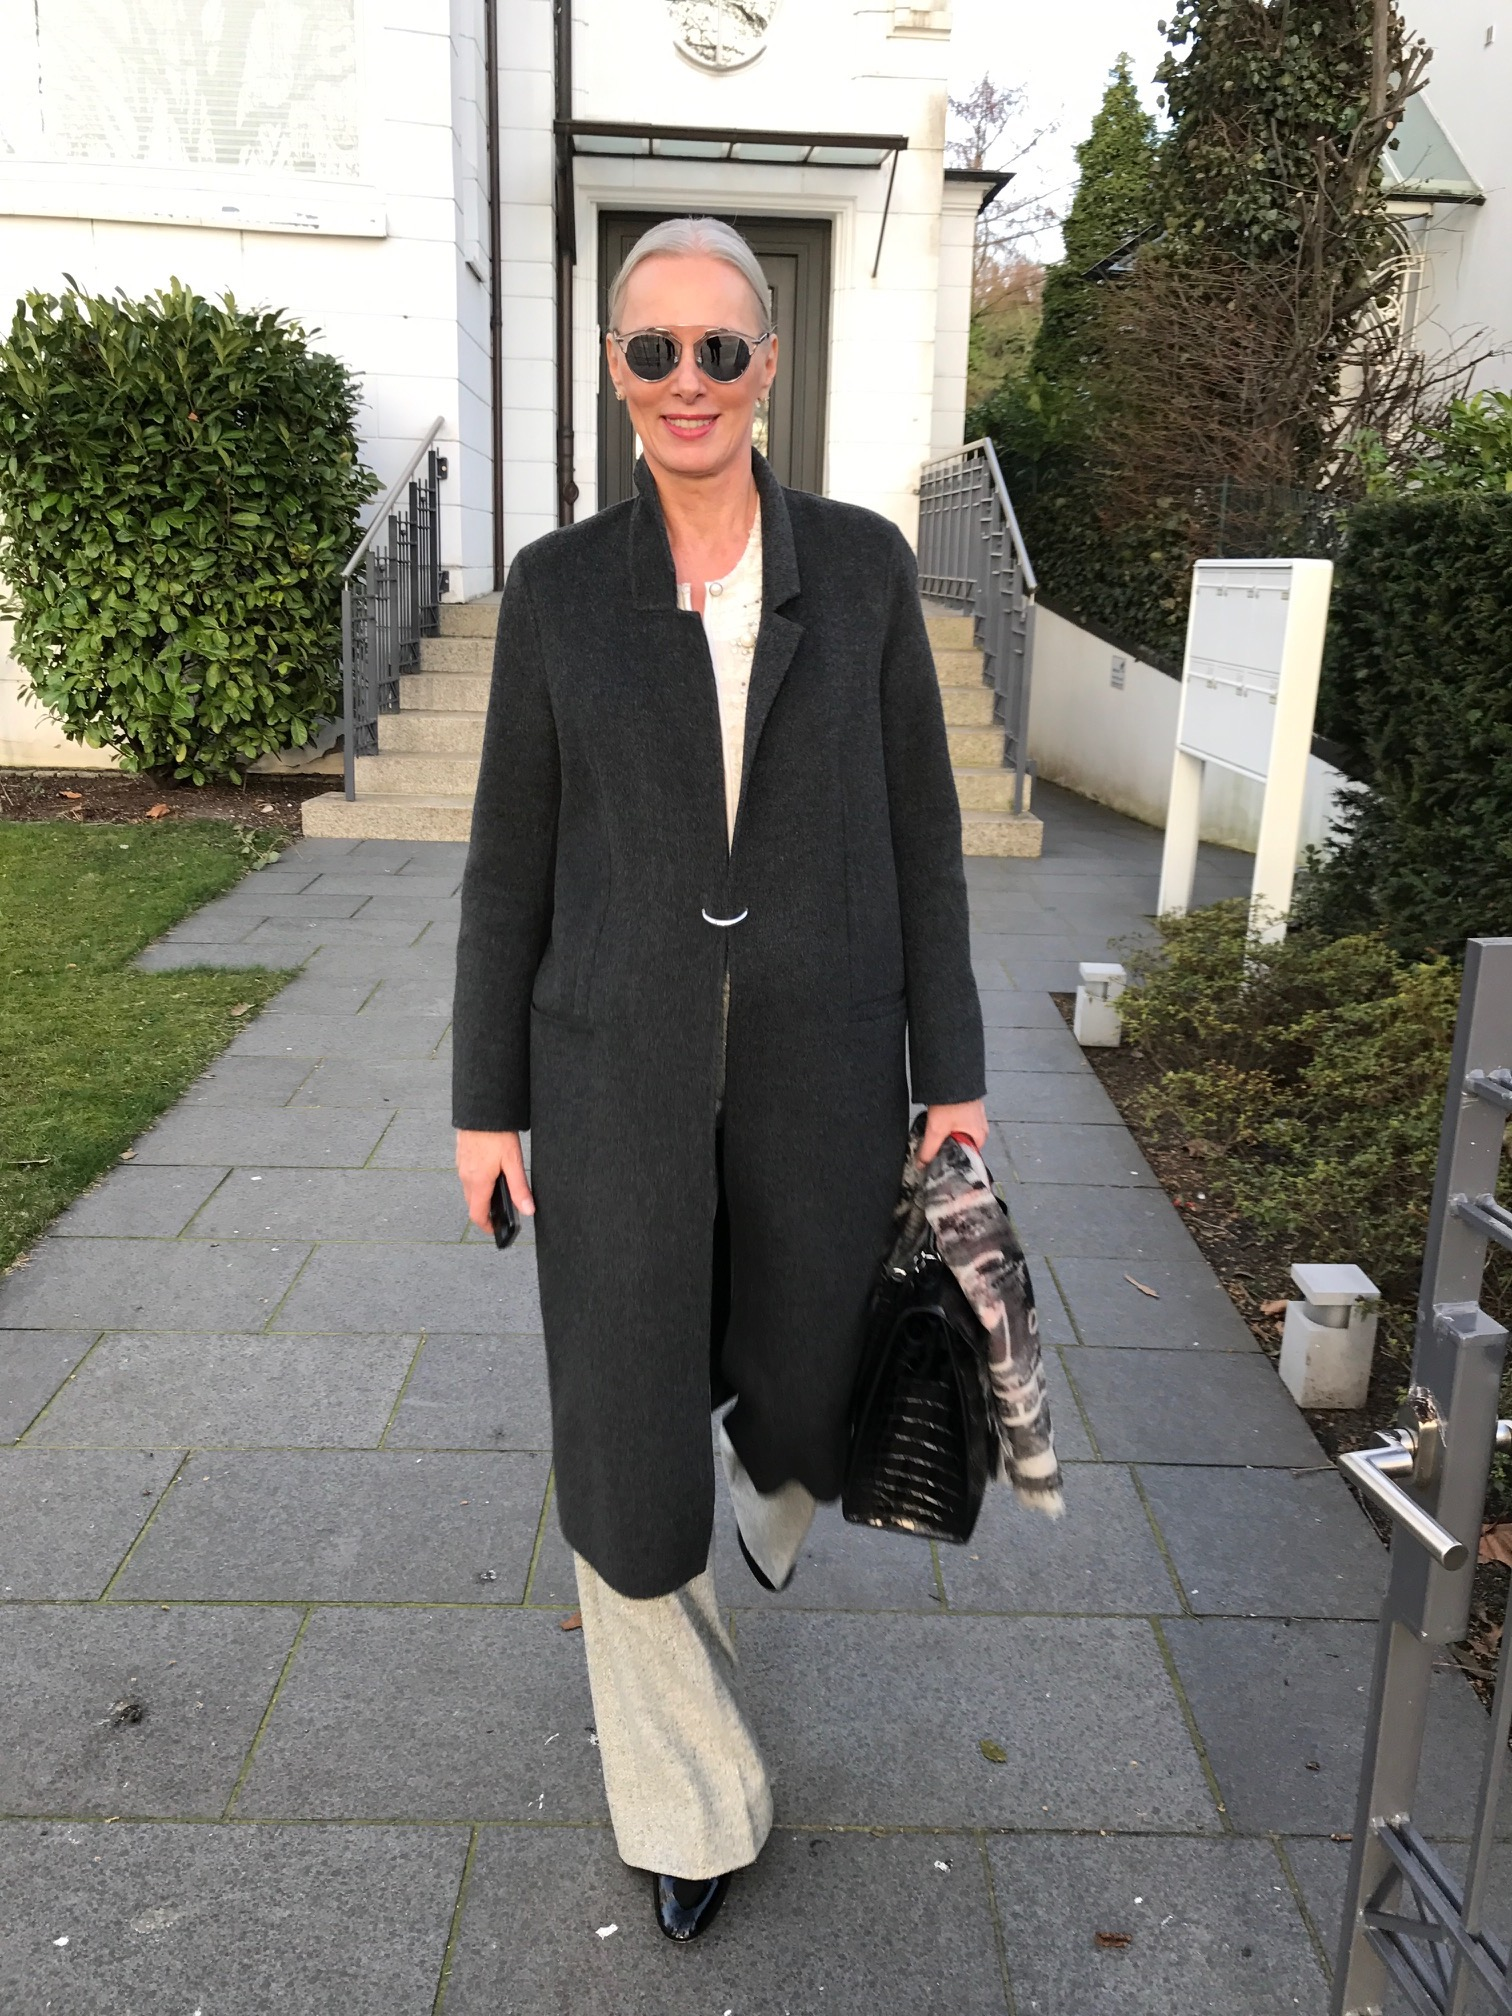 Petra van Bremen liebt klassische Looks, Petra van Bremen graues Model, reiges Model, Petra van Bremen Model, Fashion-Blog, Lieblingsstil.com,